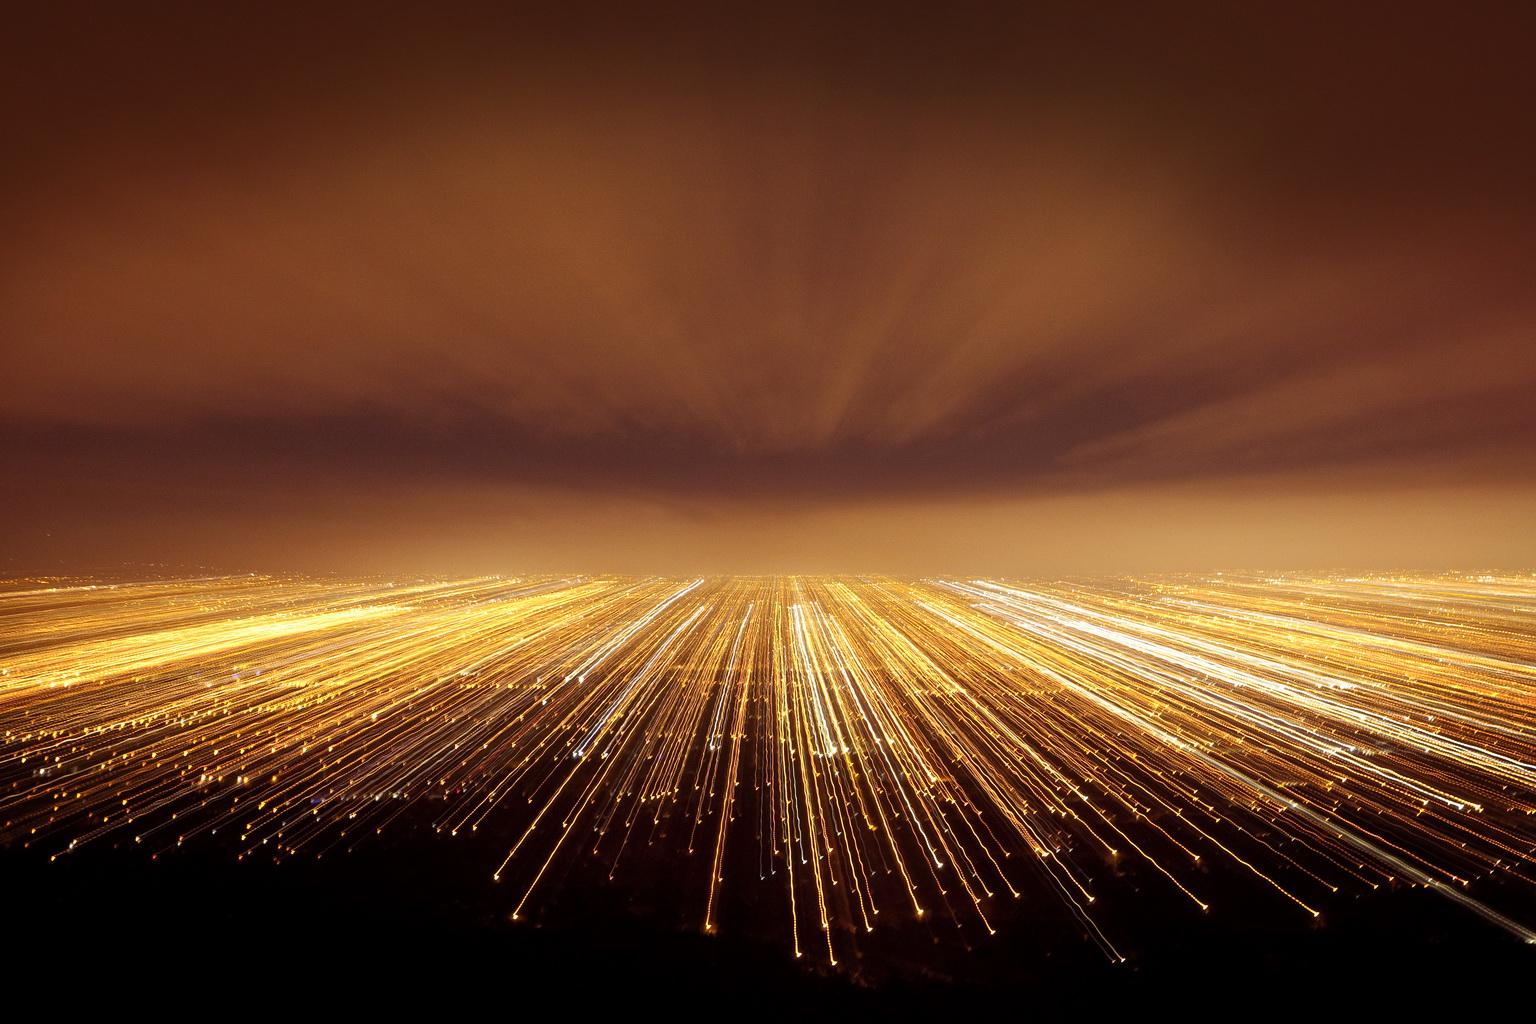 Abstract photograph of Dublin at night